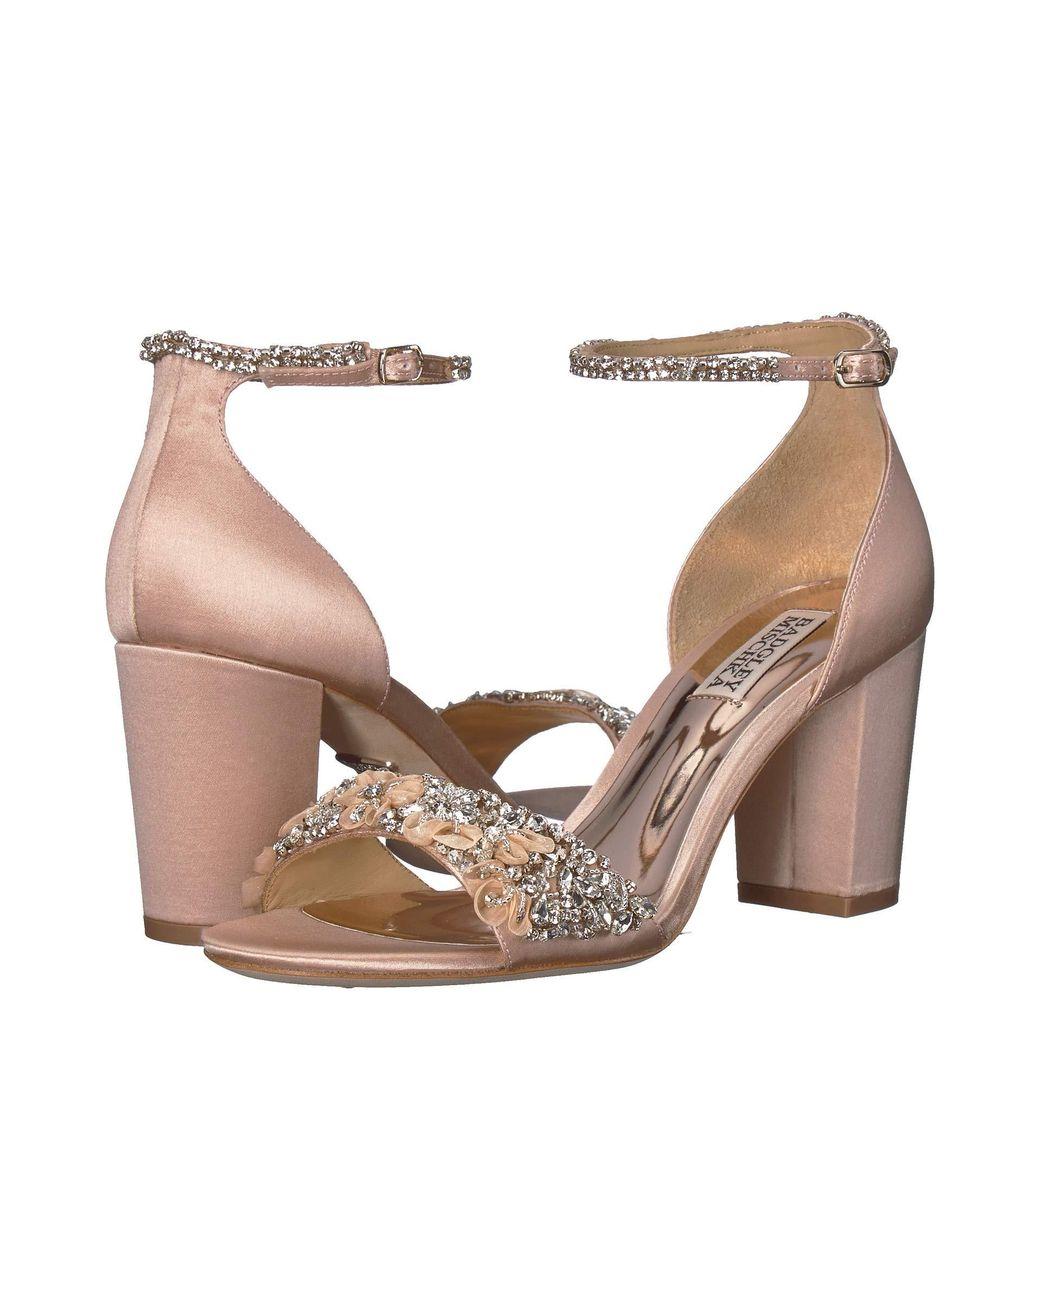 603ed8724 Lyst - Badgley Mischka Finesse (ivory Satin) Women s Shoes